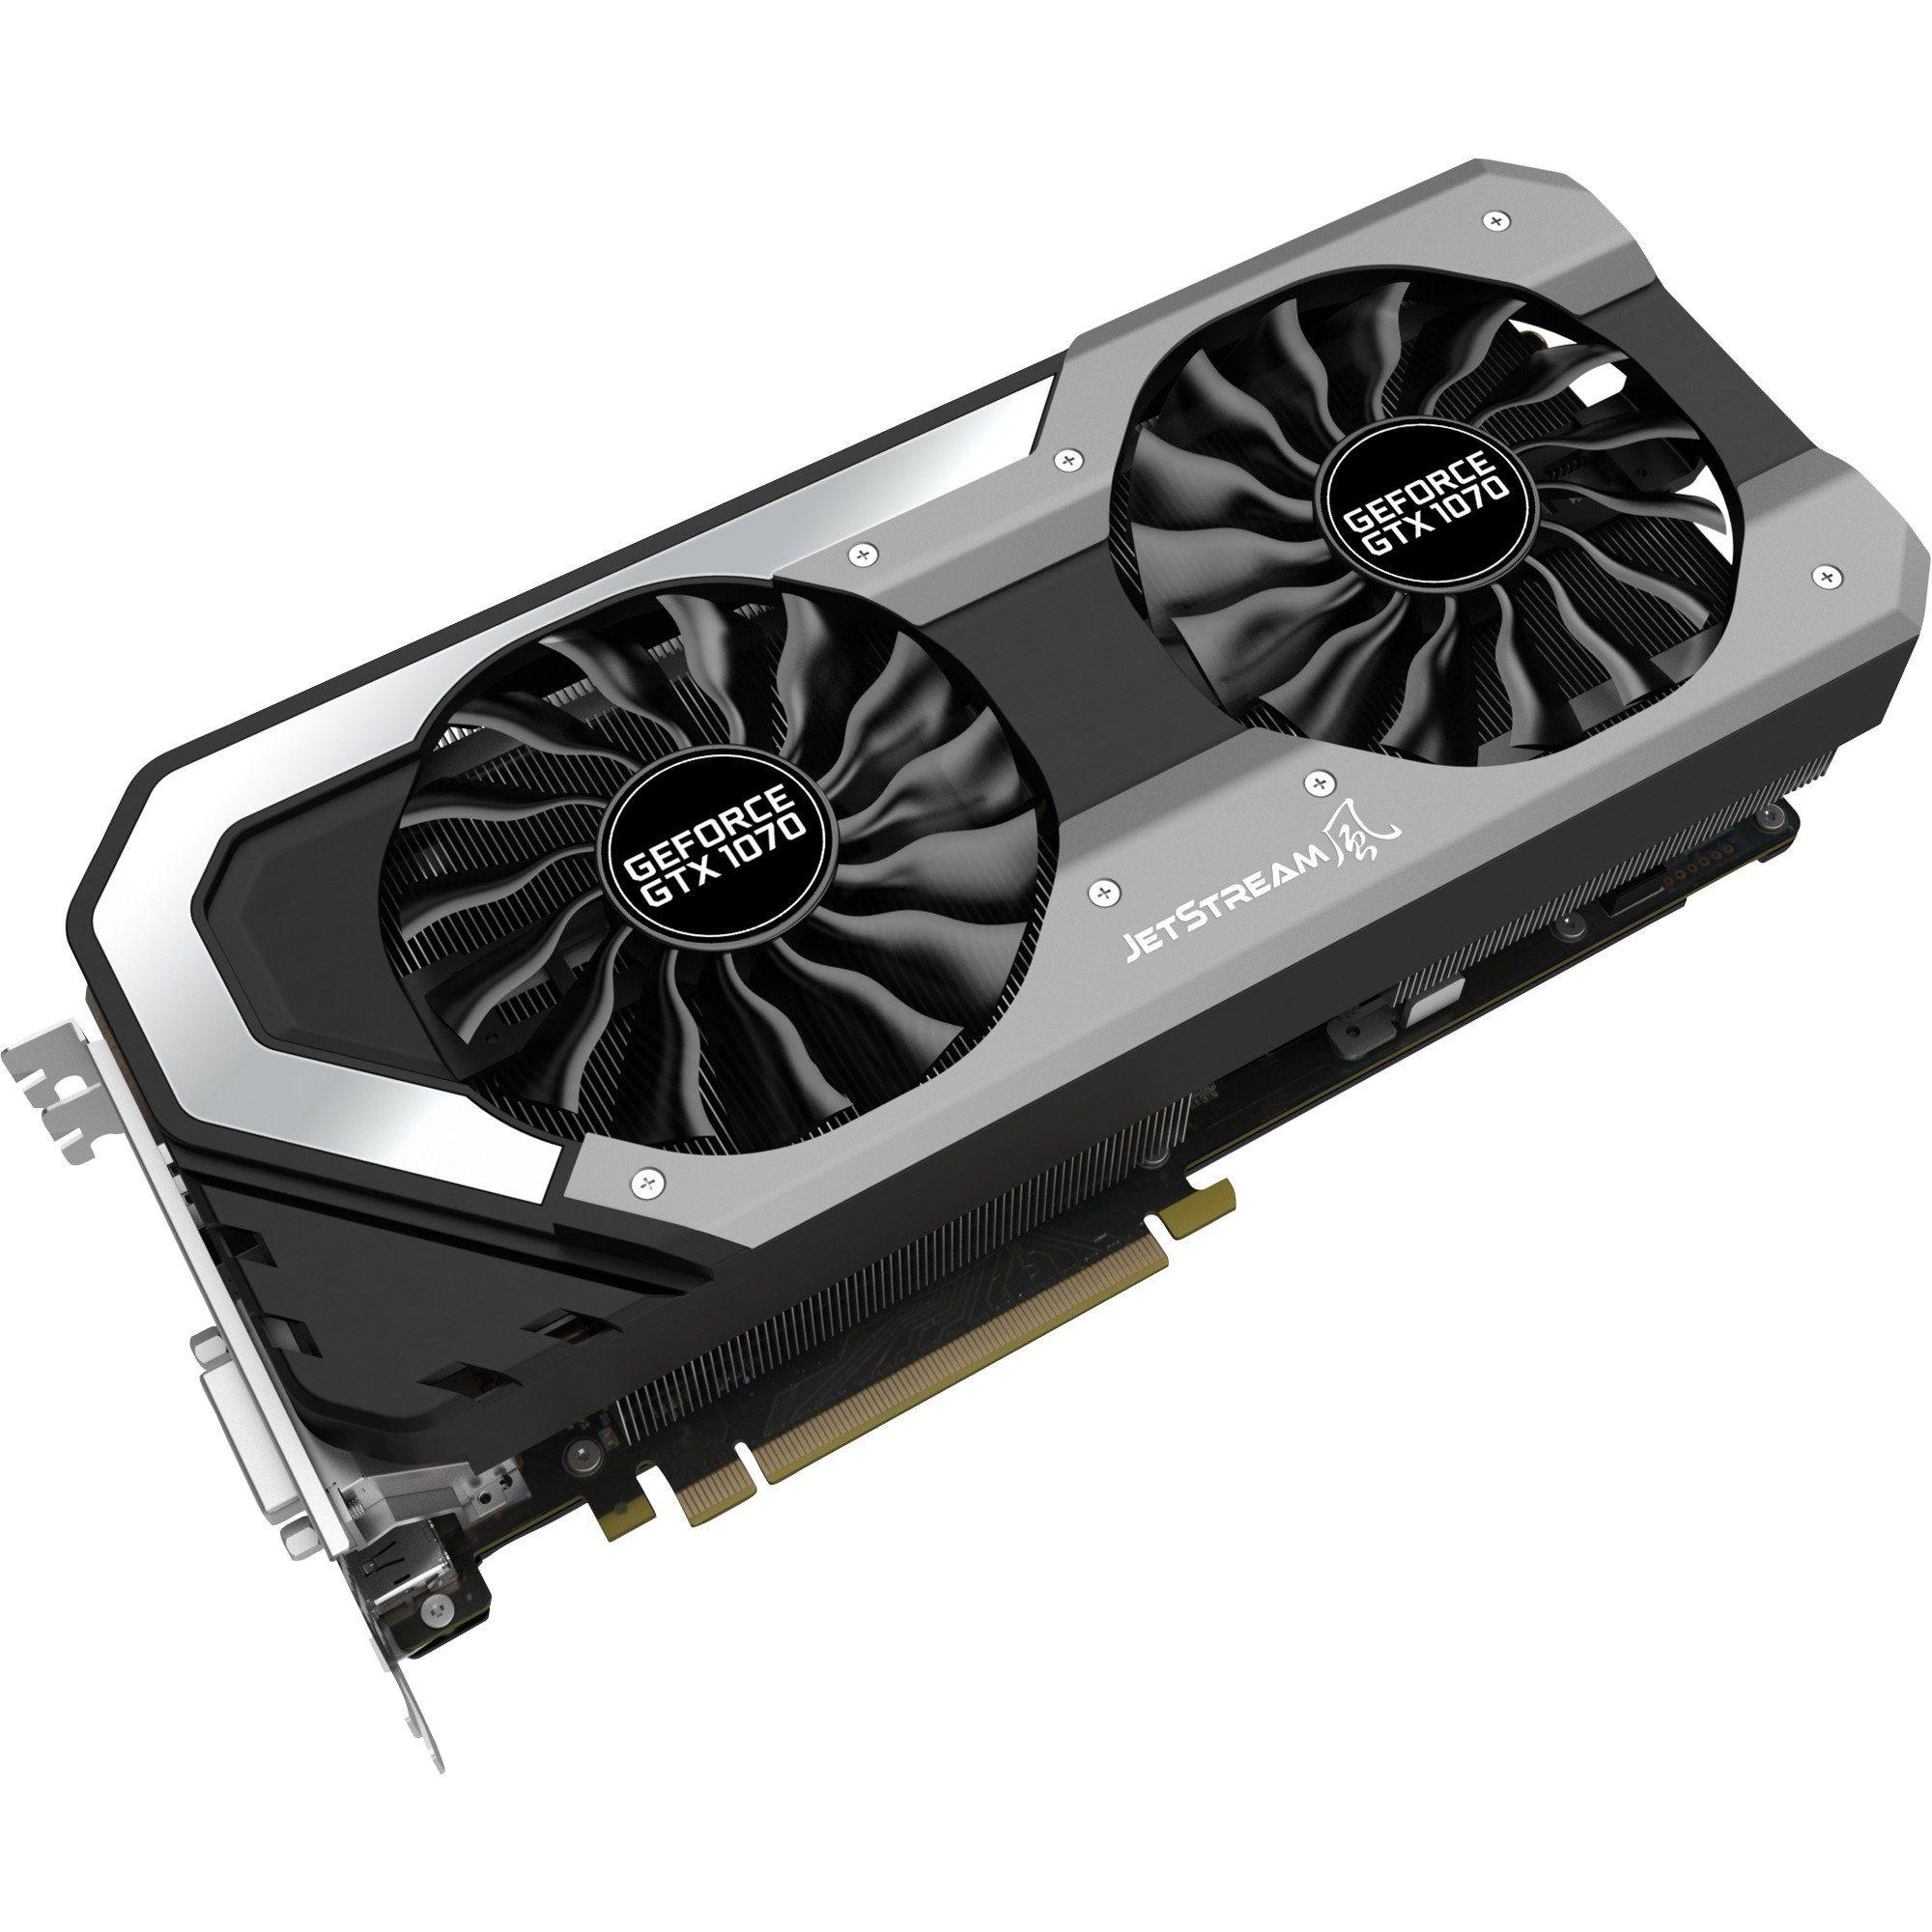 Palit Grafikkarte »GeForce GTX 1070 Jetstream«